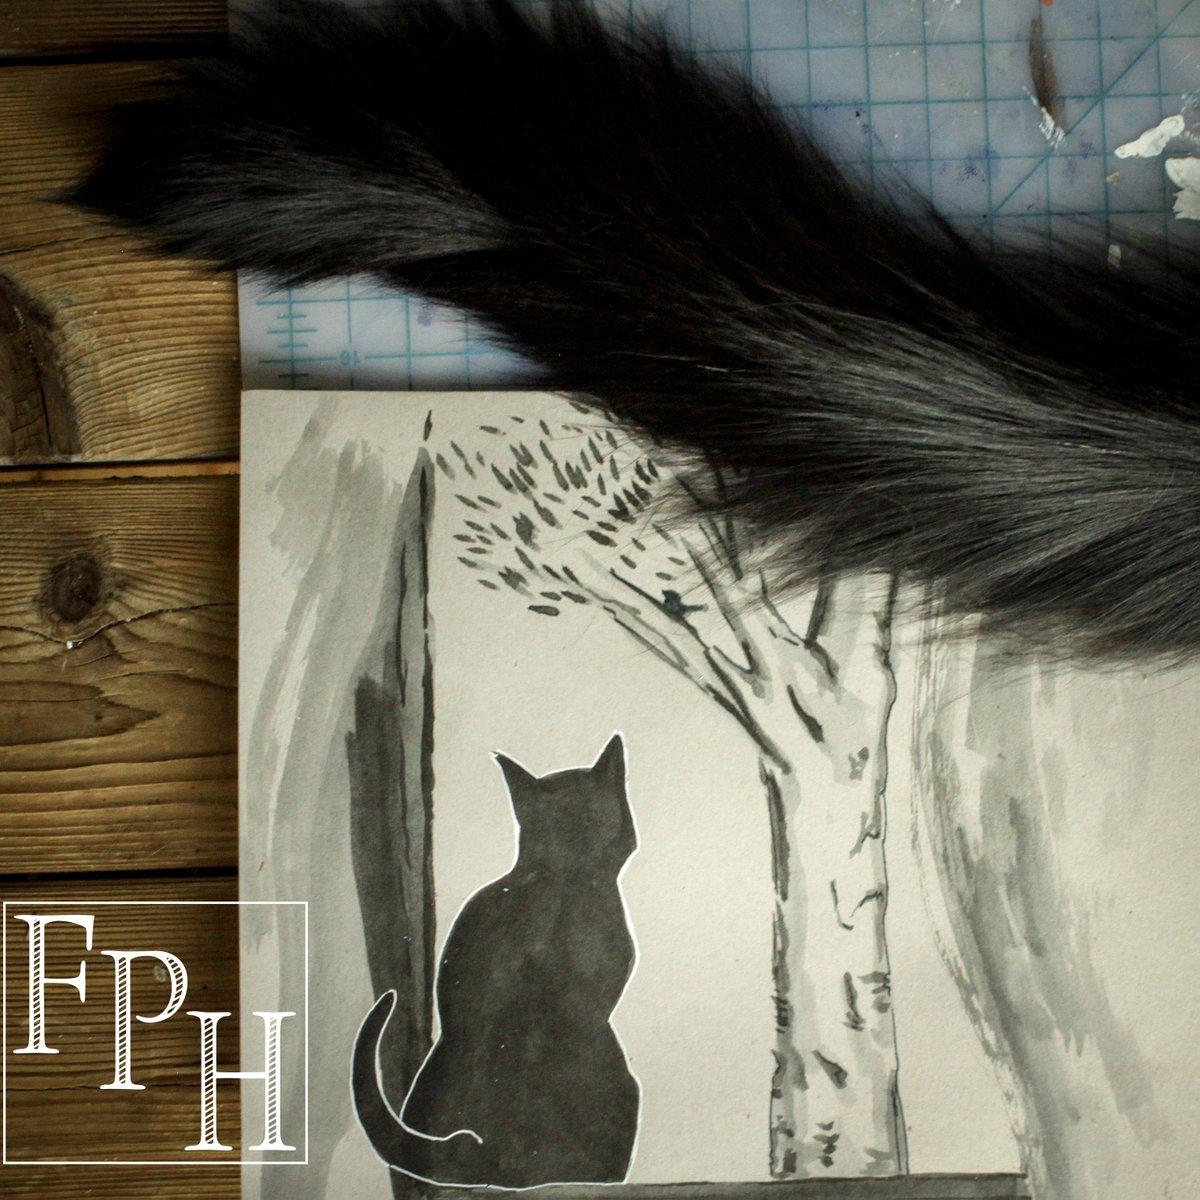 Finally, an ink as black as my cat.  (Noodler's Old Manhattan) -Mei #blackestblack #black #oldmanhattan #noodlers #cat #fph